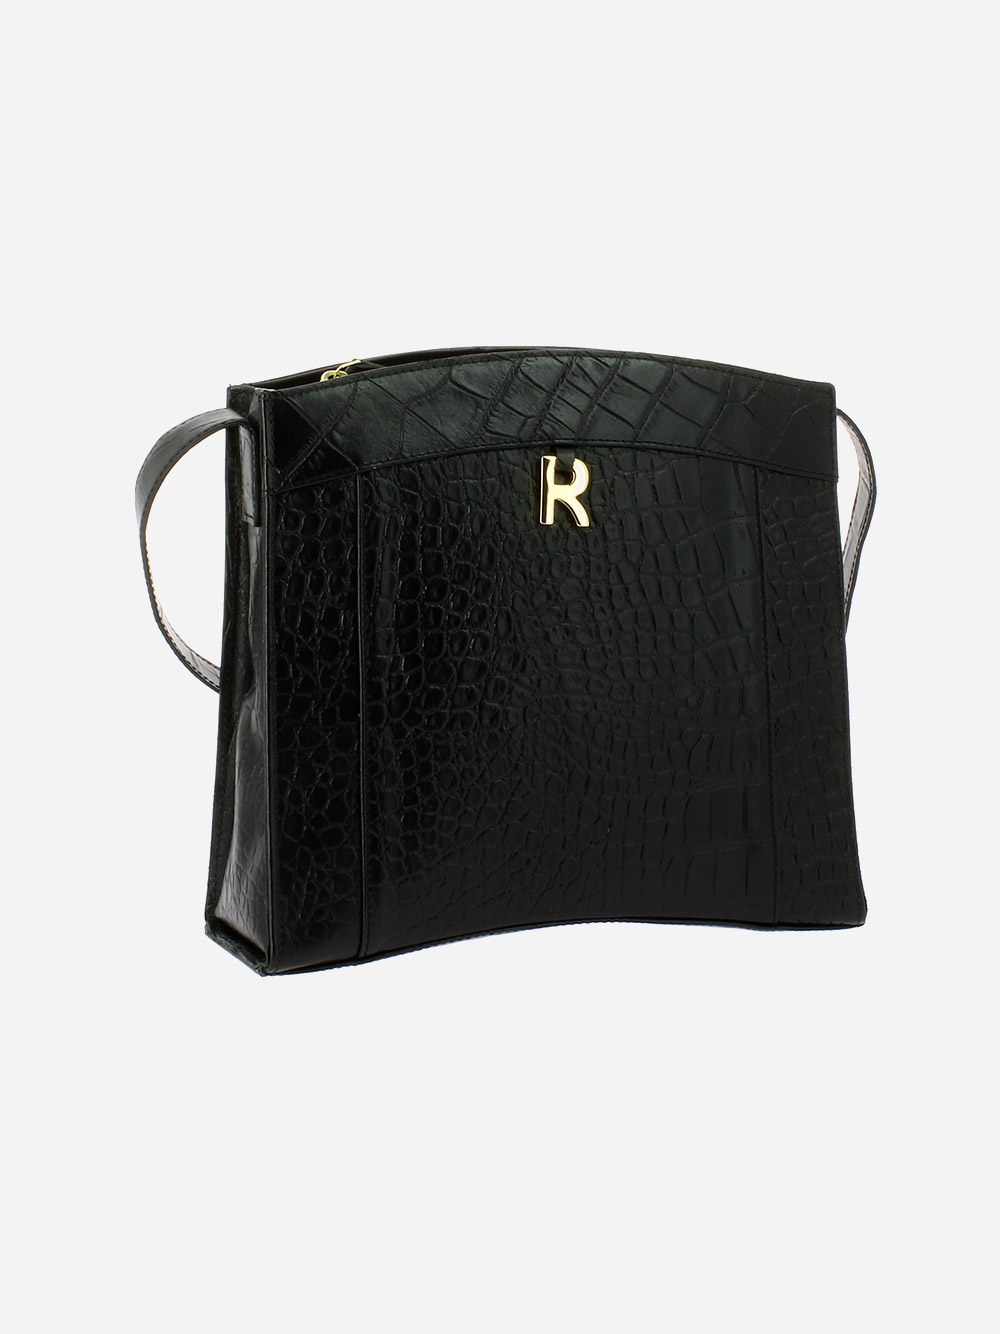 Croco Guilly Black Crossbody Bag